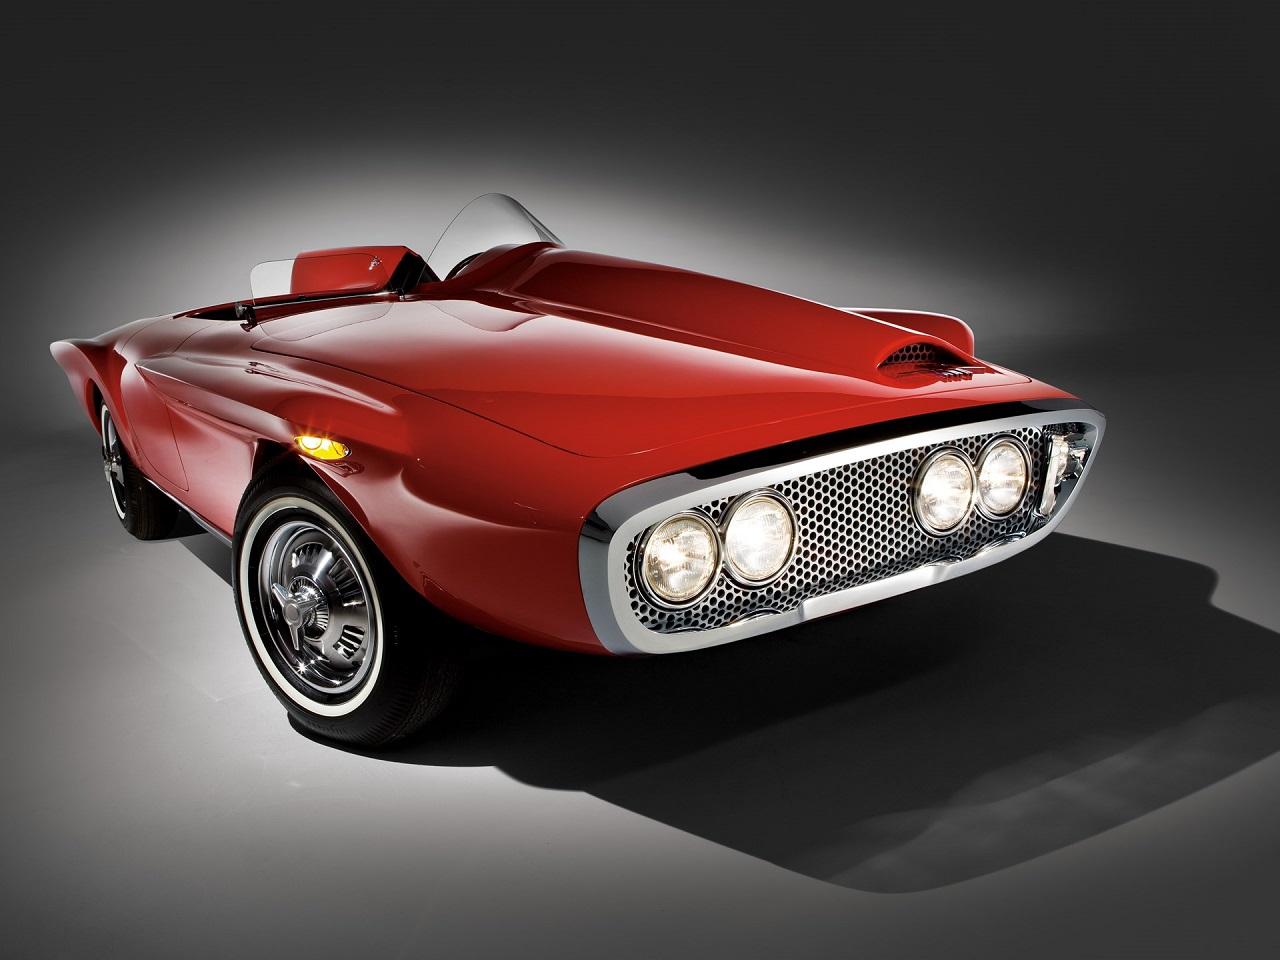 '61 Plymouth Asimmetrica Roadster Ghia - Vous avez dit bizarre ? 4